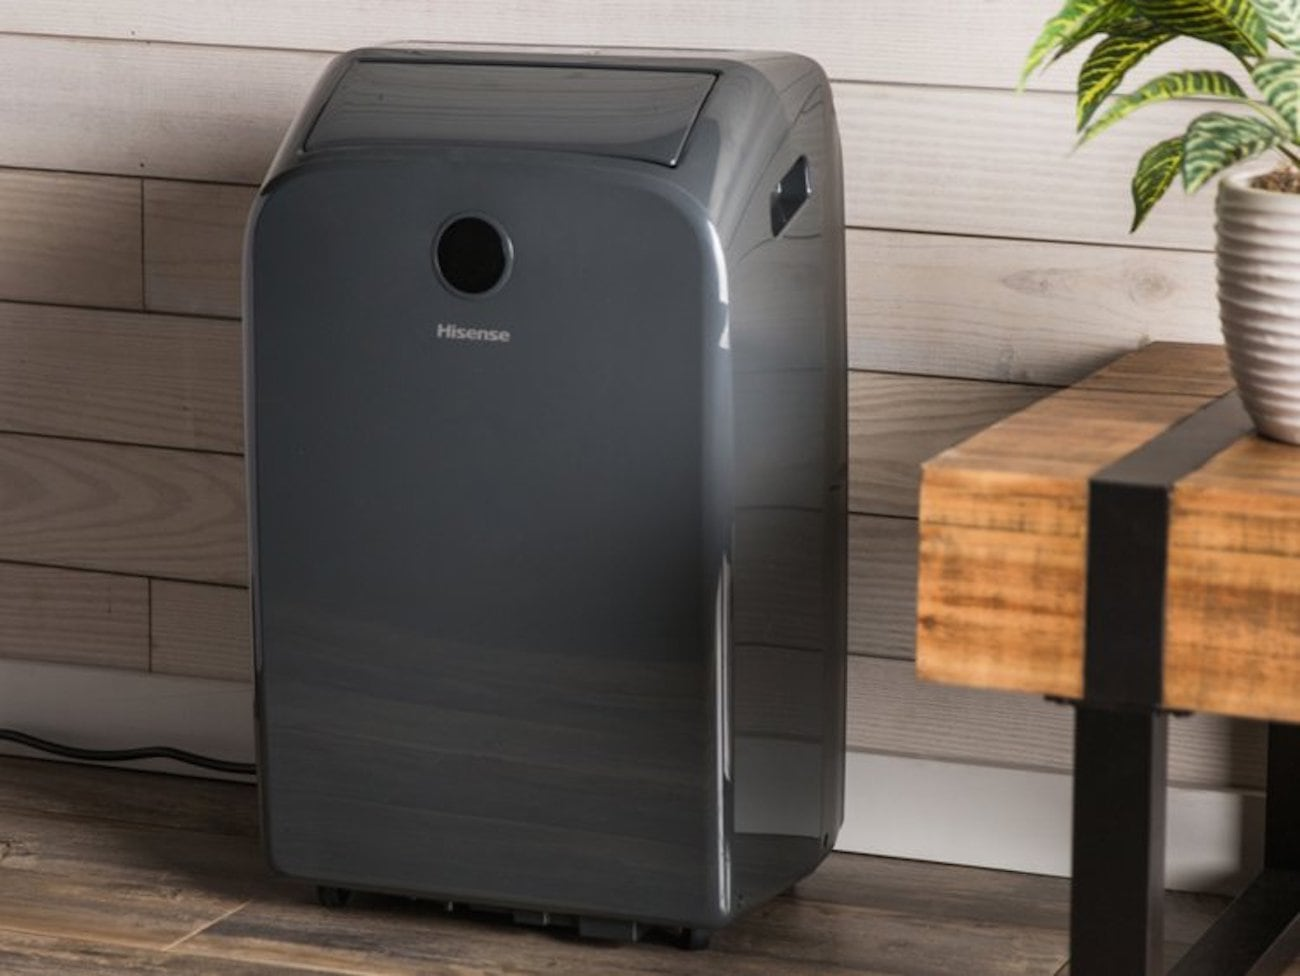 How to survive a heatwave with technology - Hisense Hi-Smart 01